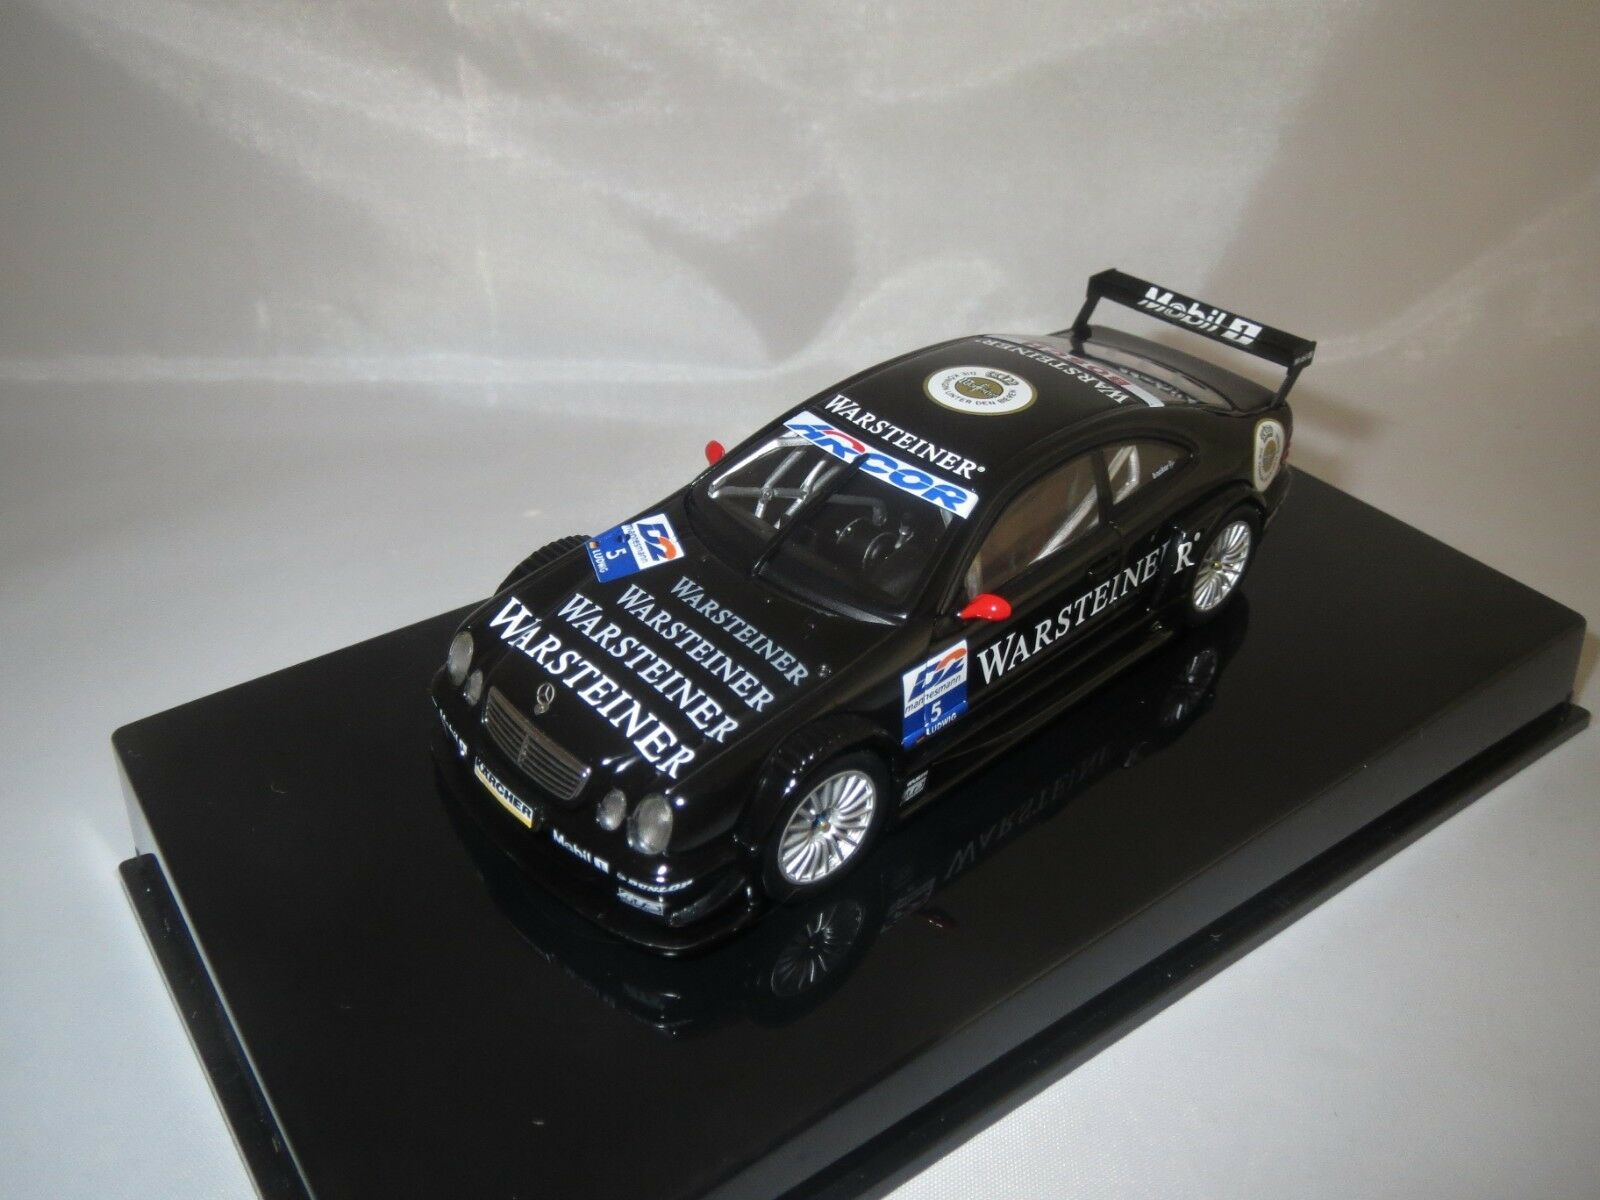 Autoart MERCEDES-BENZ CLK-DTM AMG  Ludwig  5  (Nero) 1 43 in vetrina